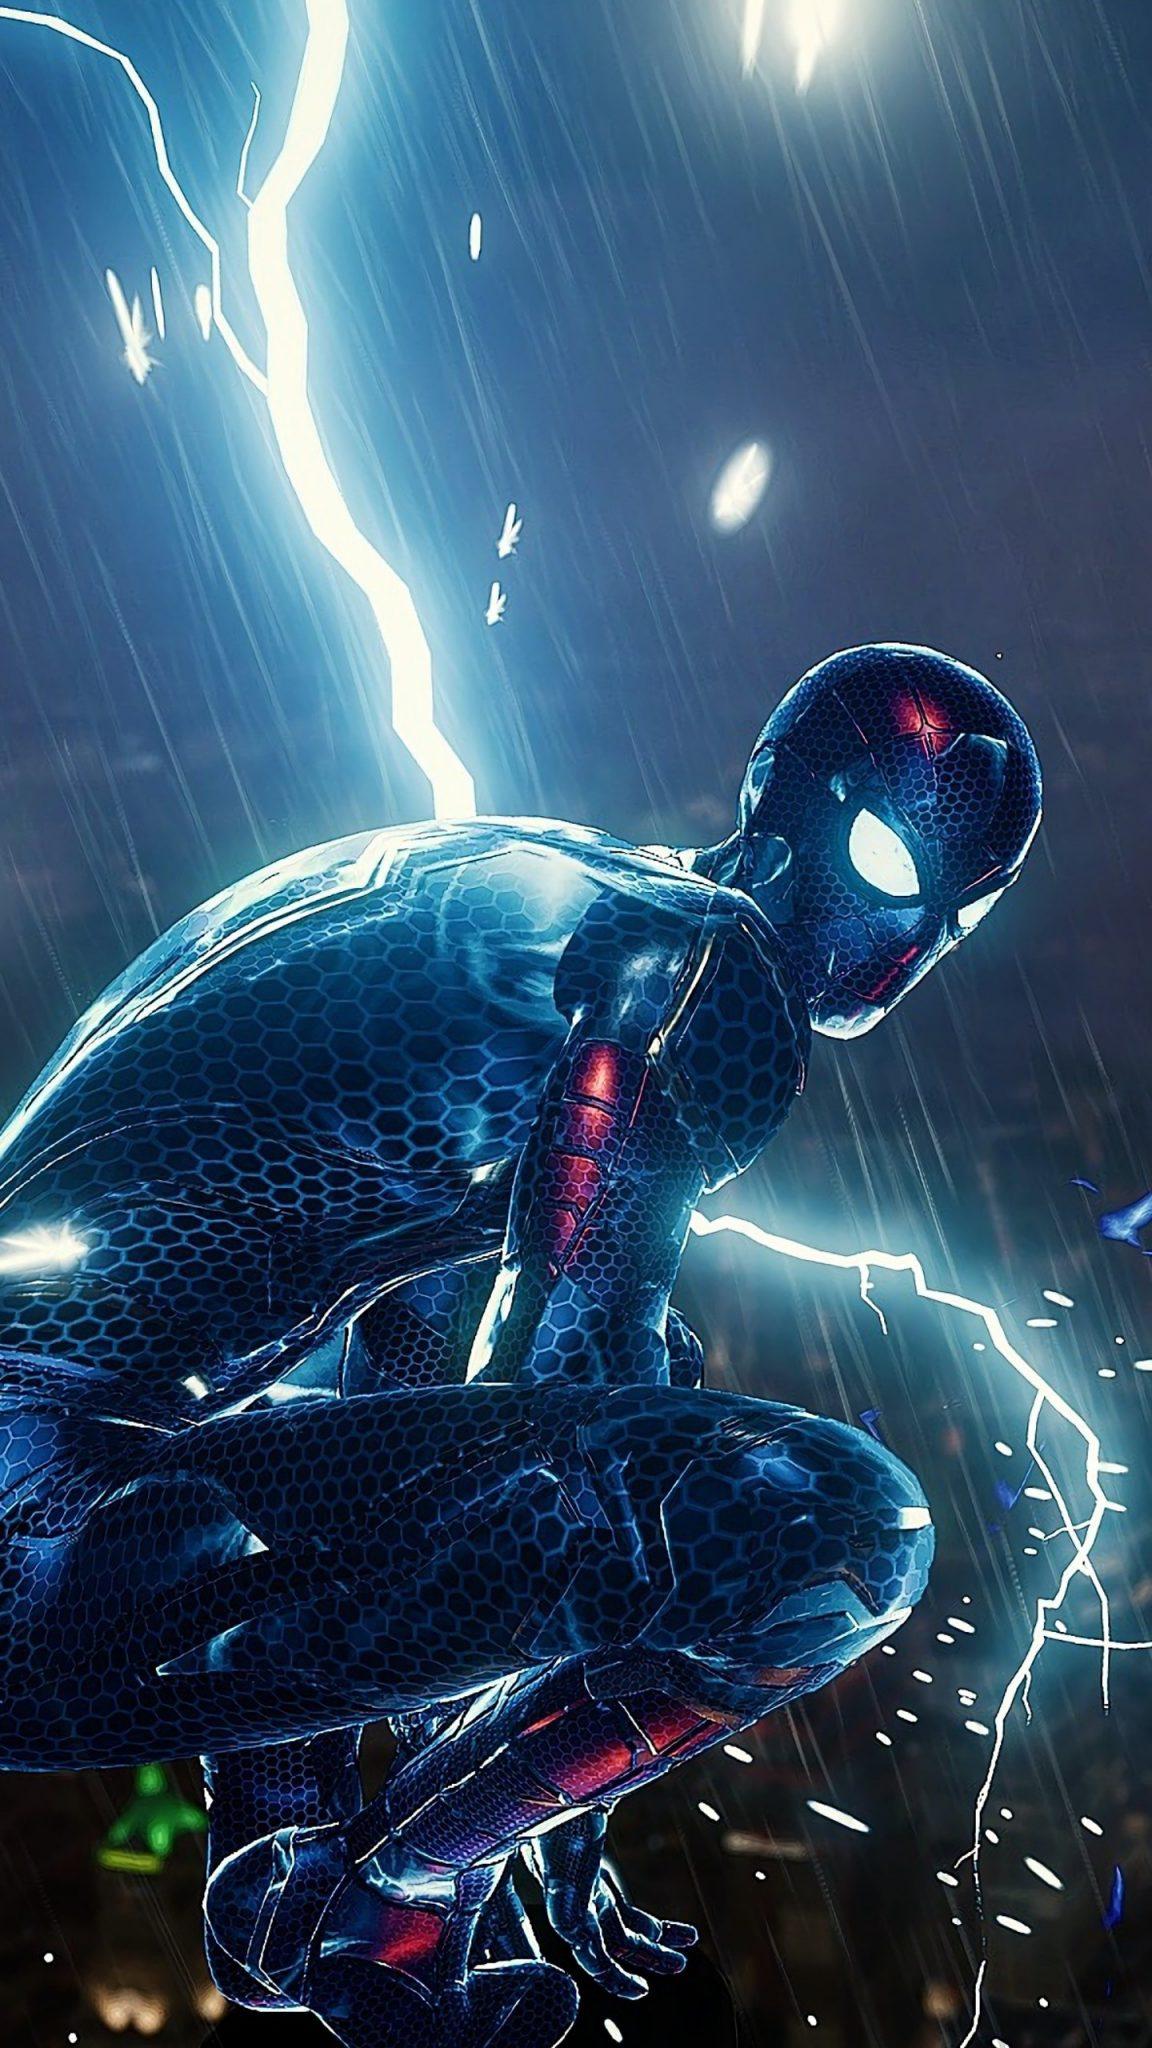 Future Spiderman Wallpaper - iPhone Wallpapers